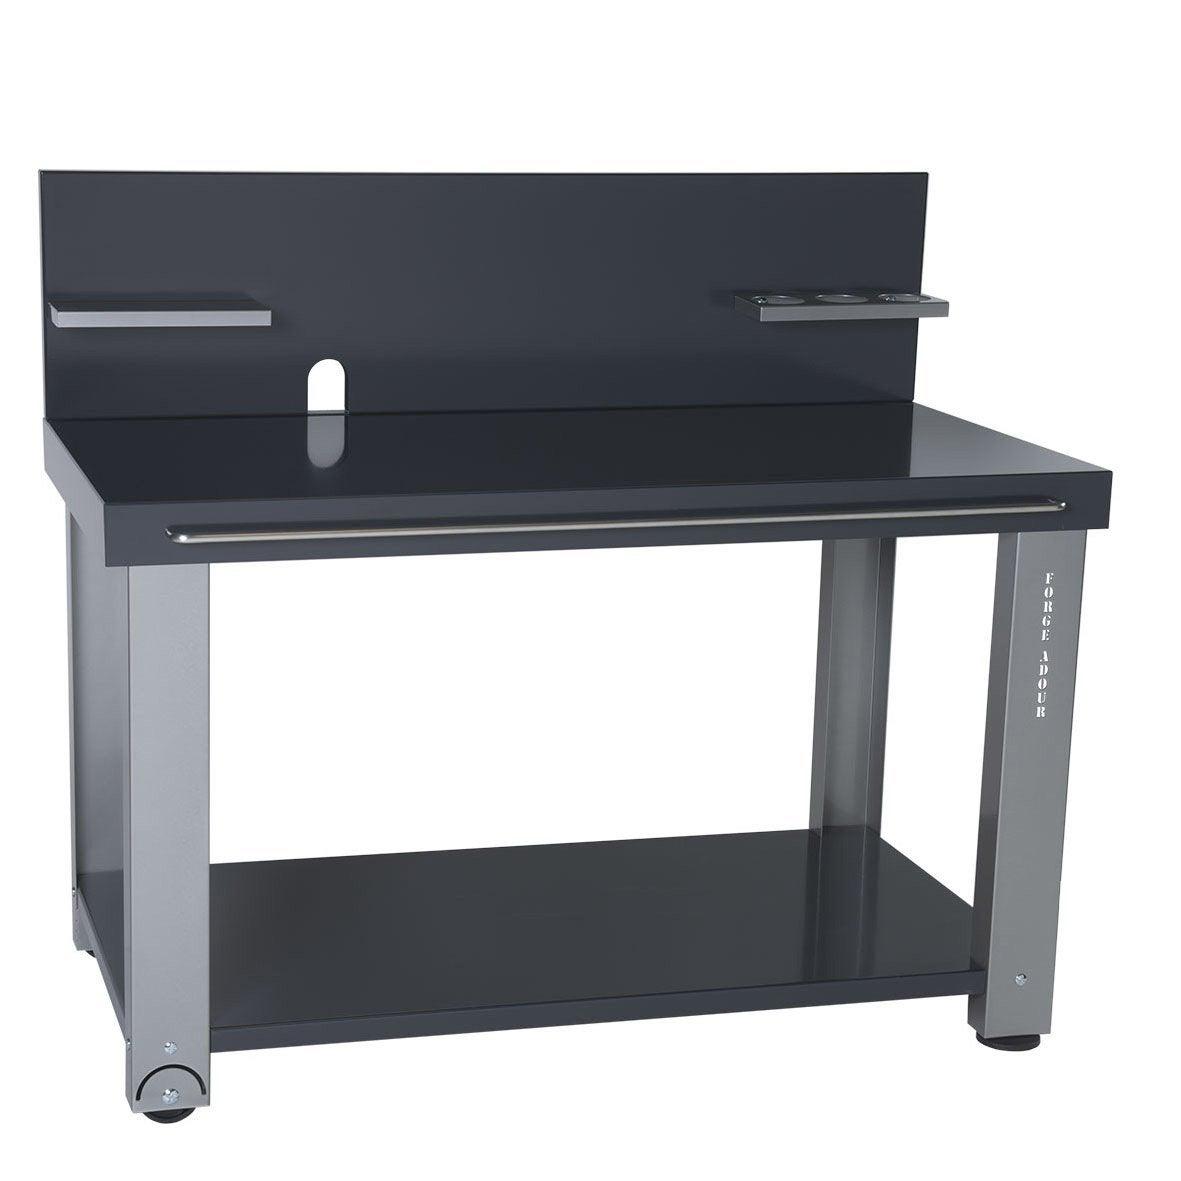 chariot forge adour cred gris leroy merlin. Black Bedroom Furniture Sets. Home Design Ideas